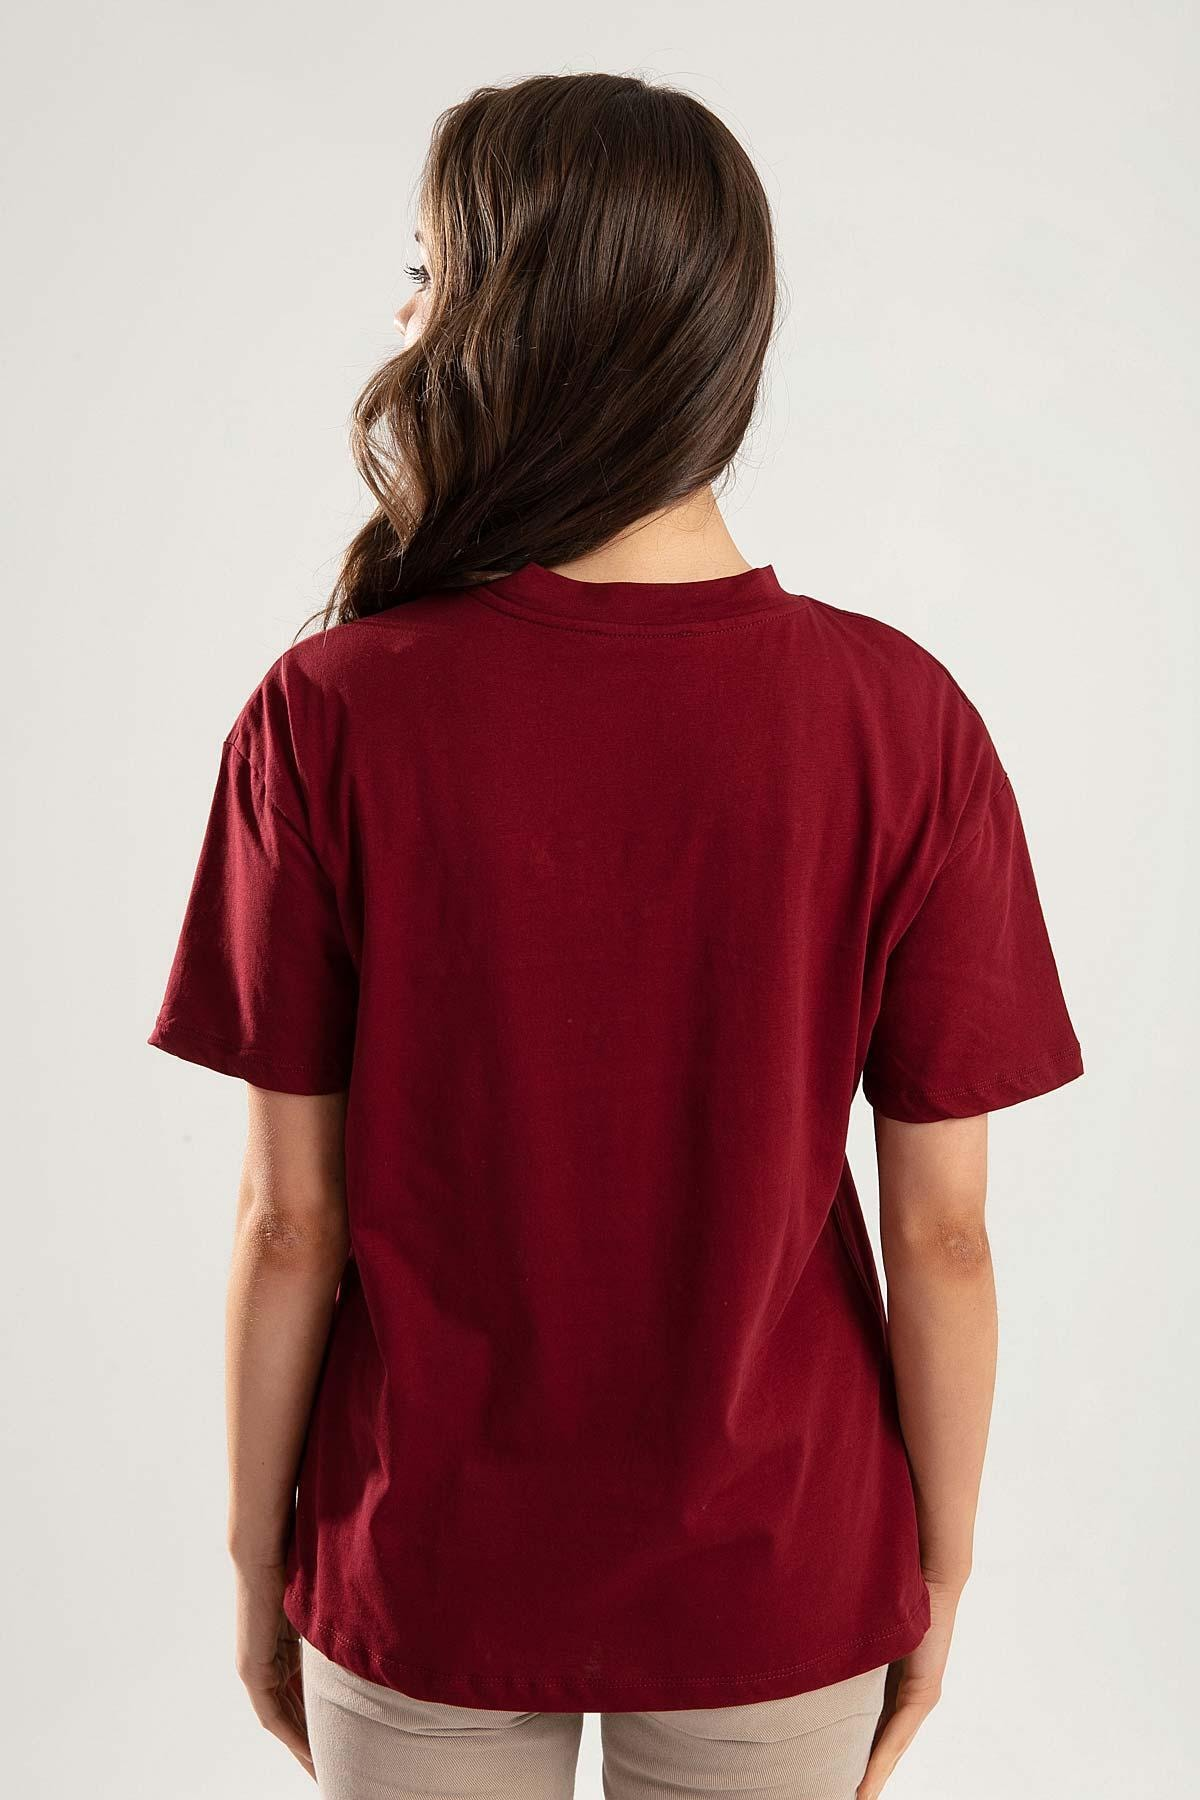 Pattaya Kadın Bordo Dik Yaka Basic Tişört PTTY20S-701 3